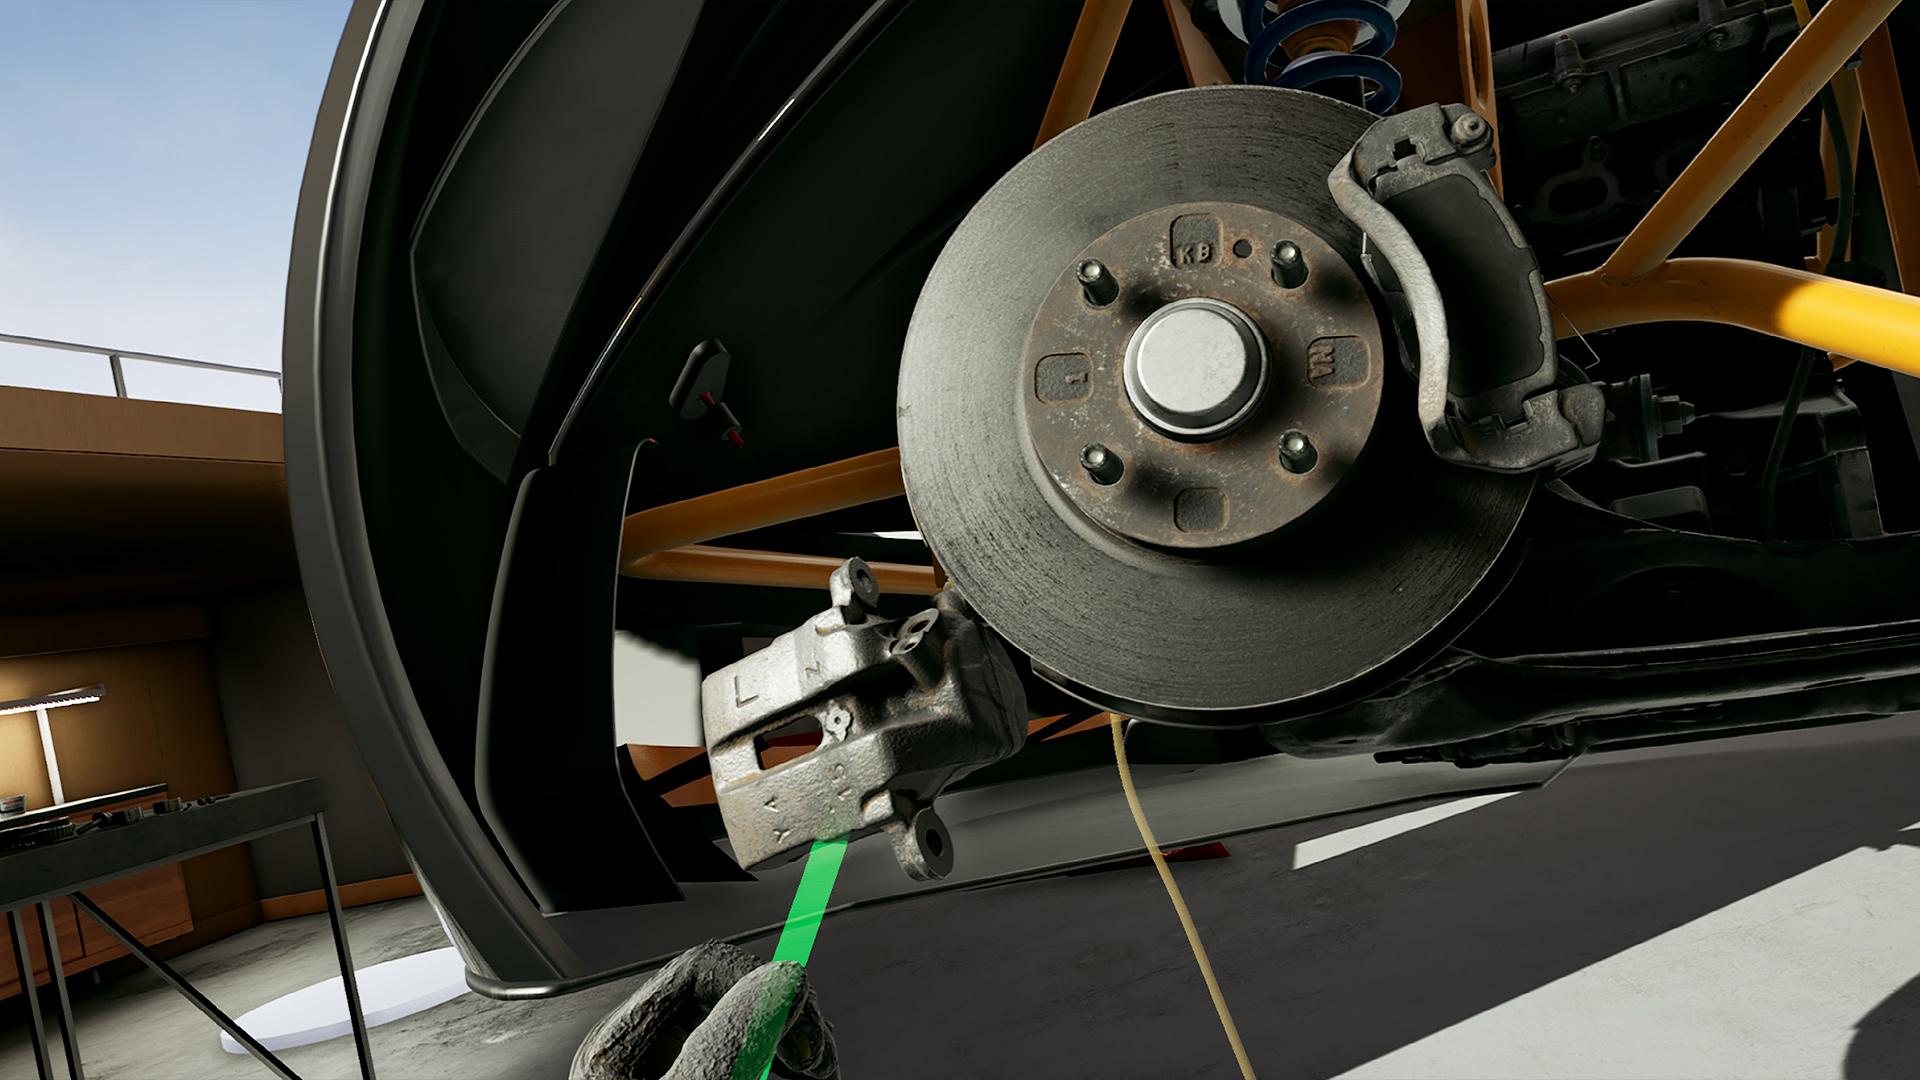 Wrench-Oculus-Rift-HTC-Vive-Steam